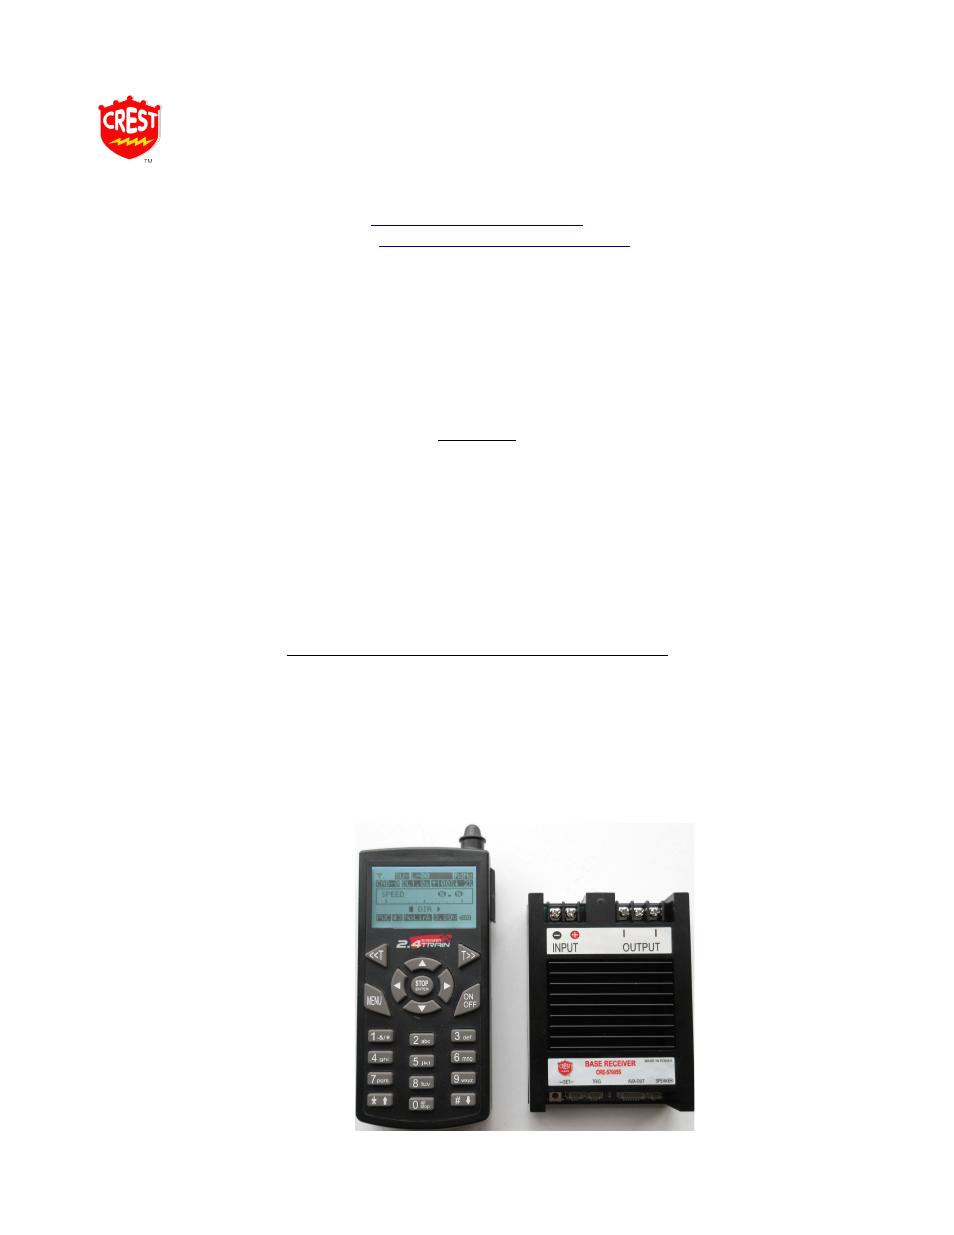 Crest Electronics Cre57005s Base Station Super Receiver User